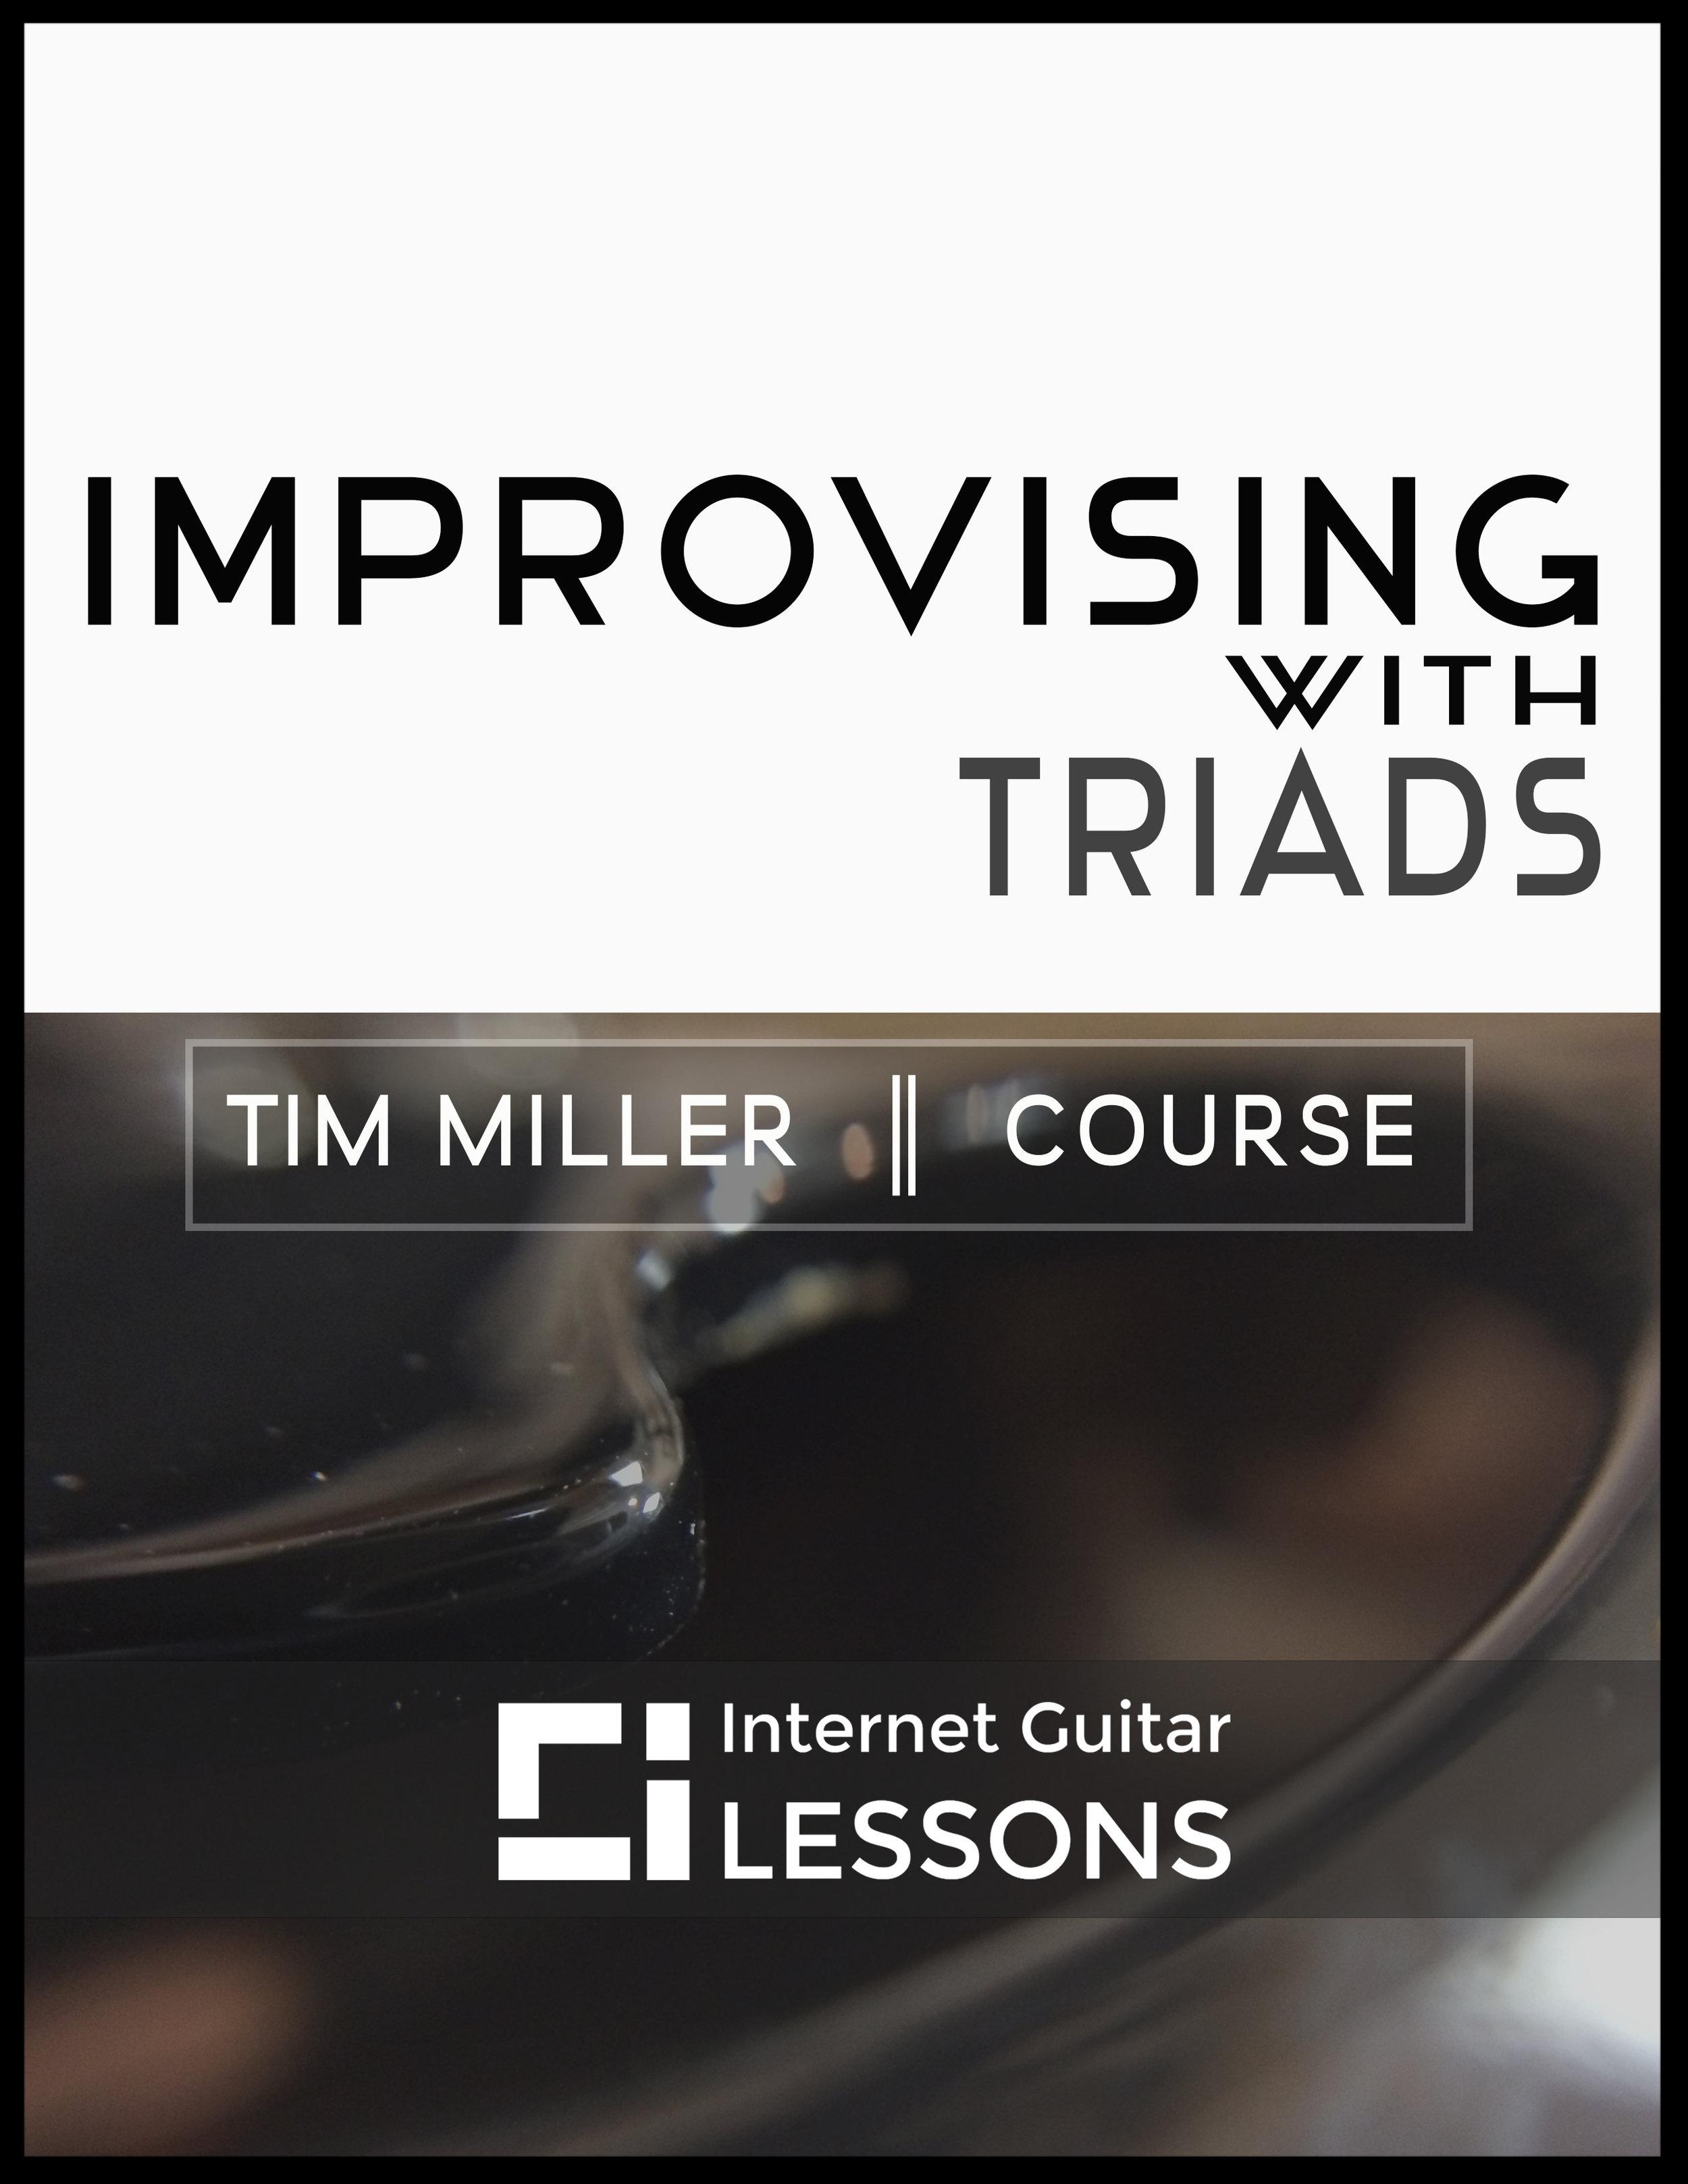 Improvising with Triads 1.17 flat.jpg